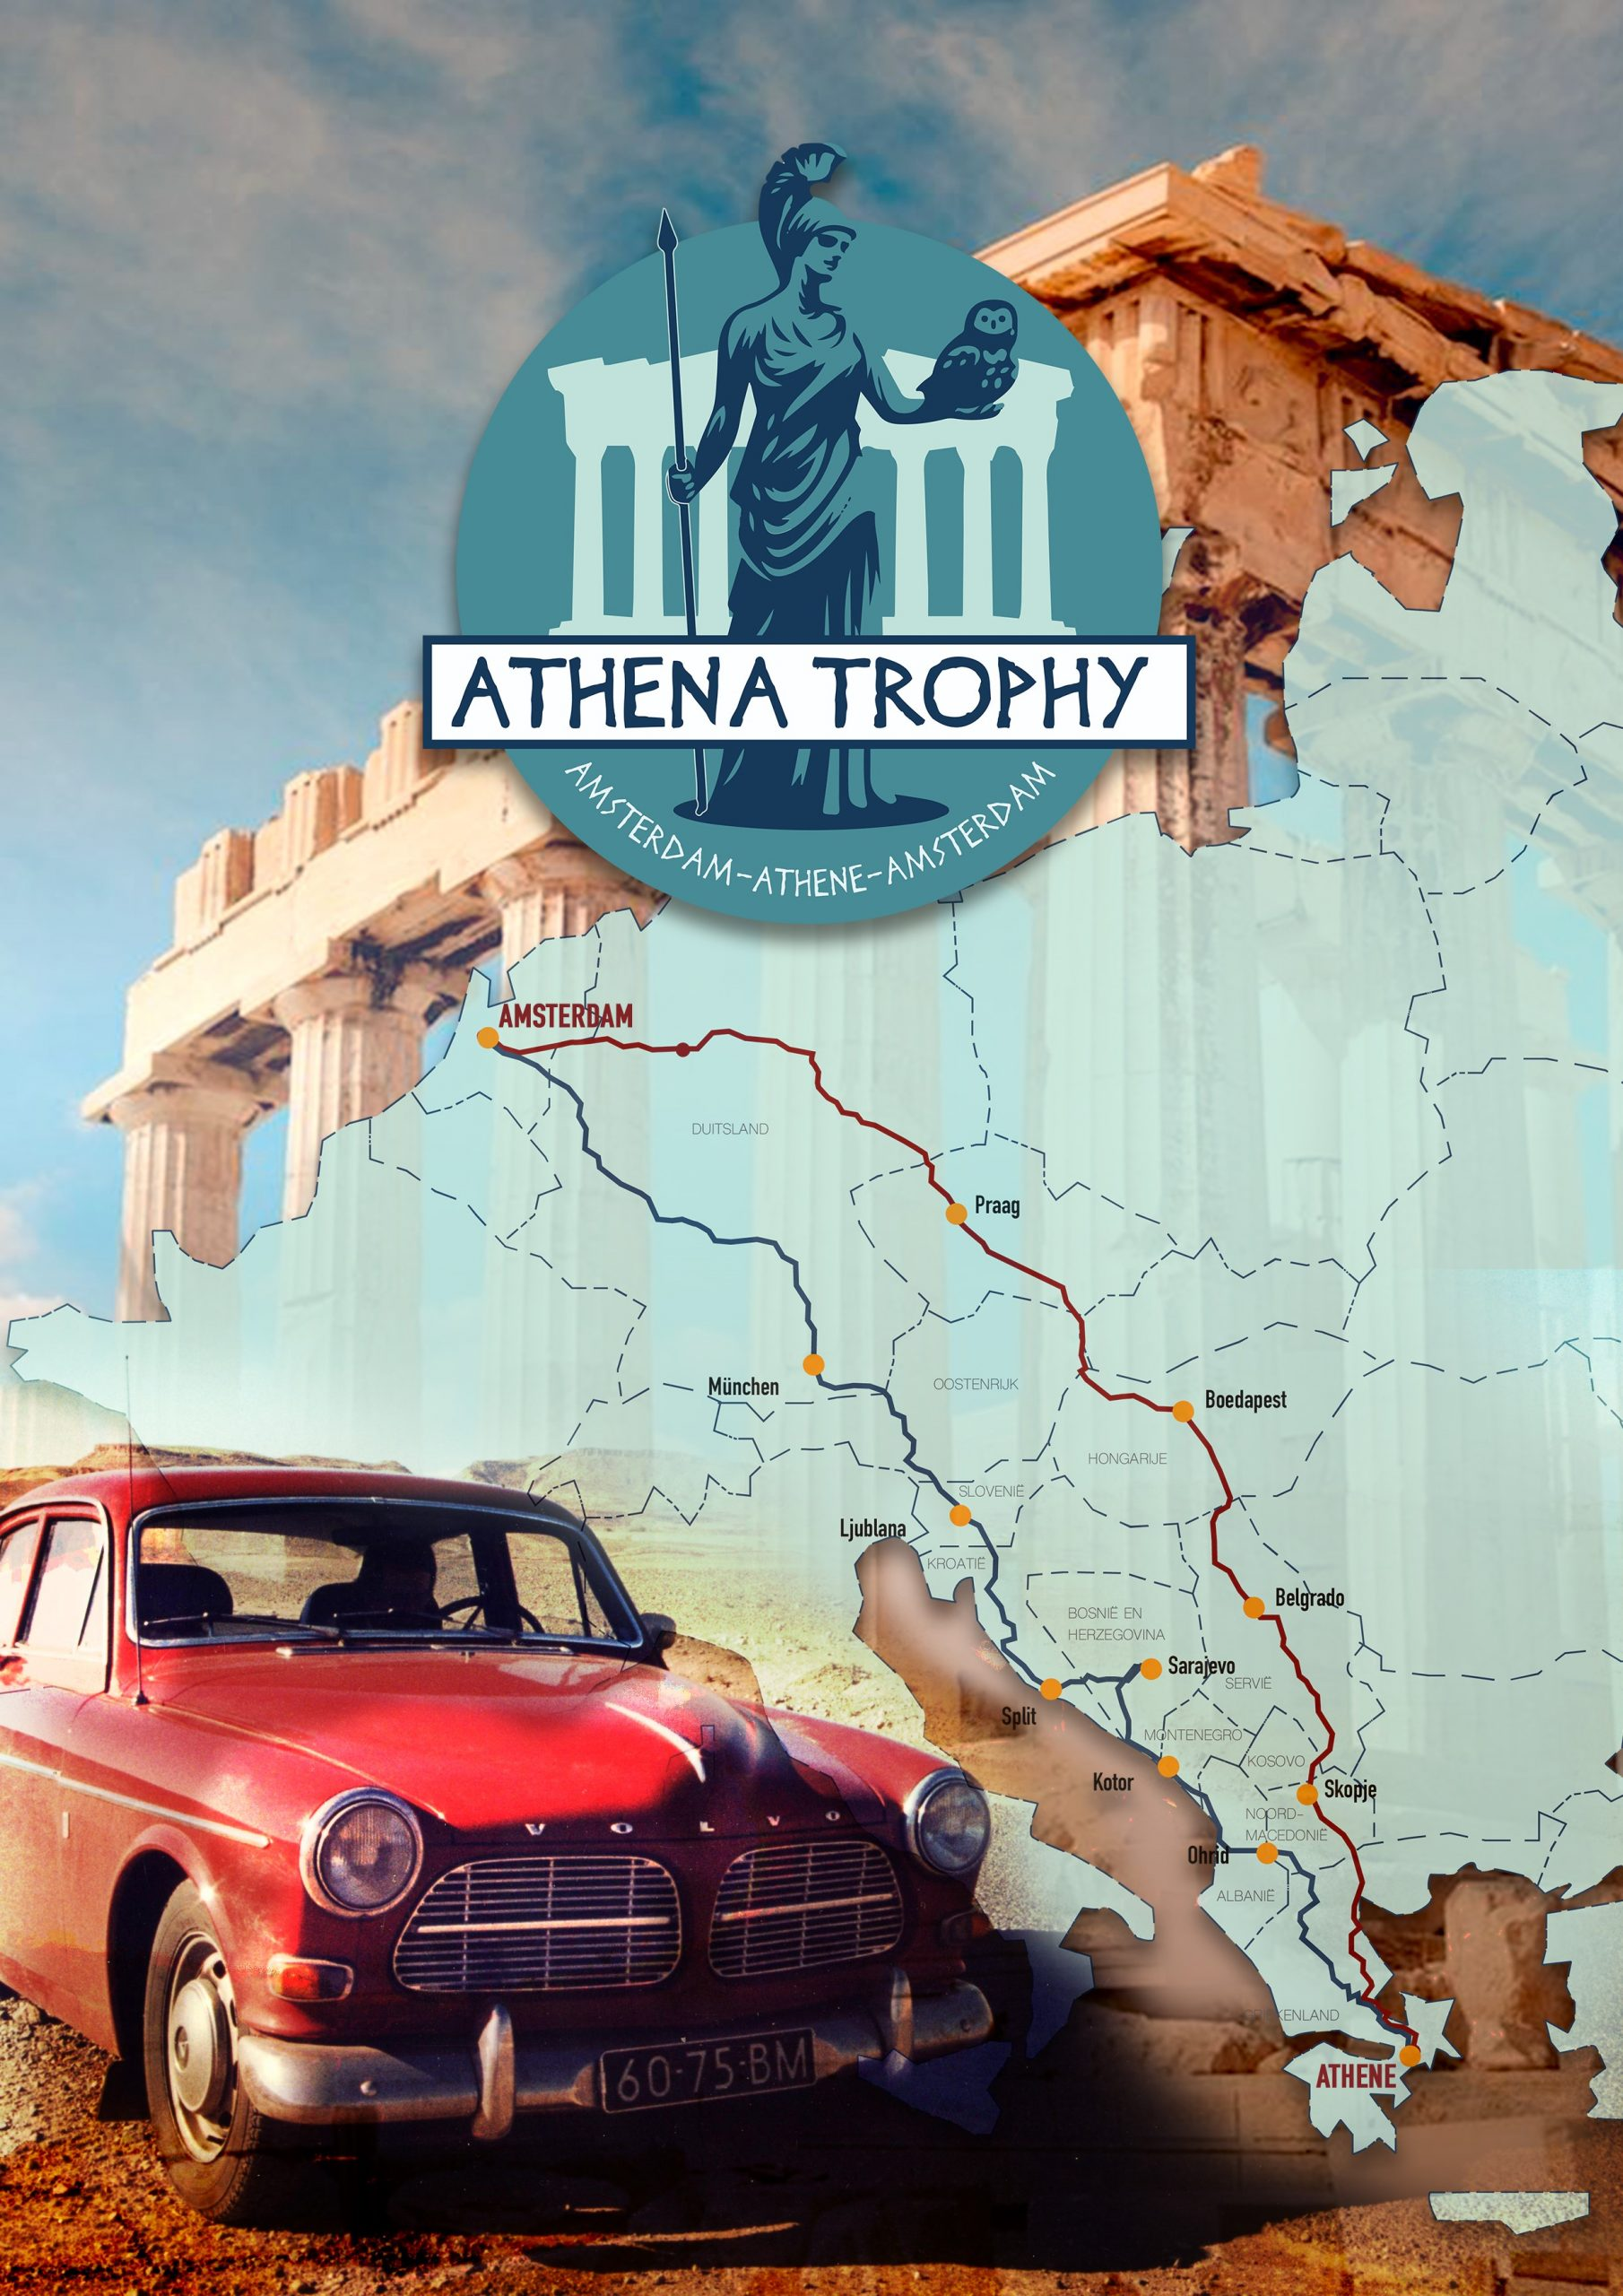 Athene Trophy